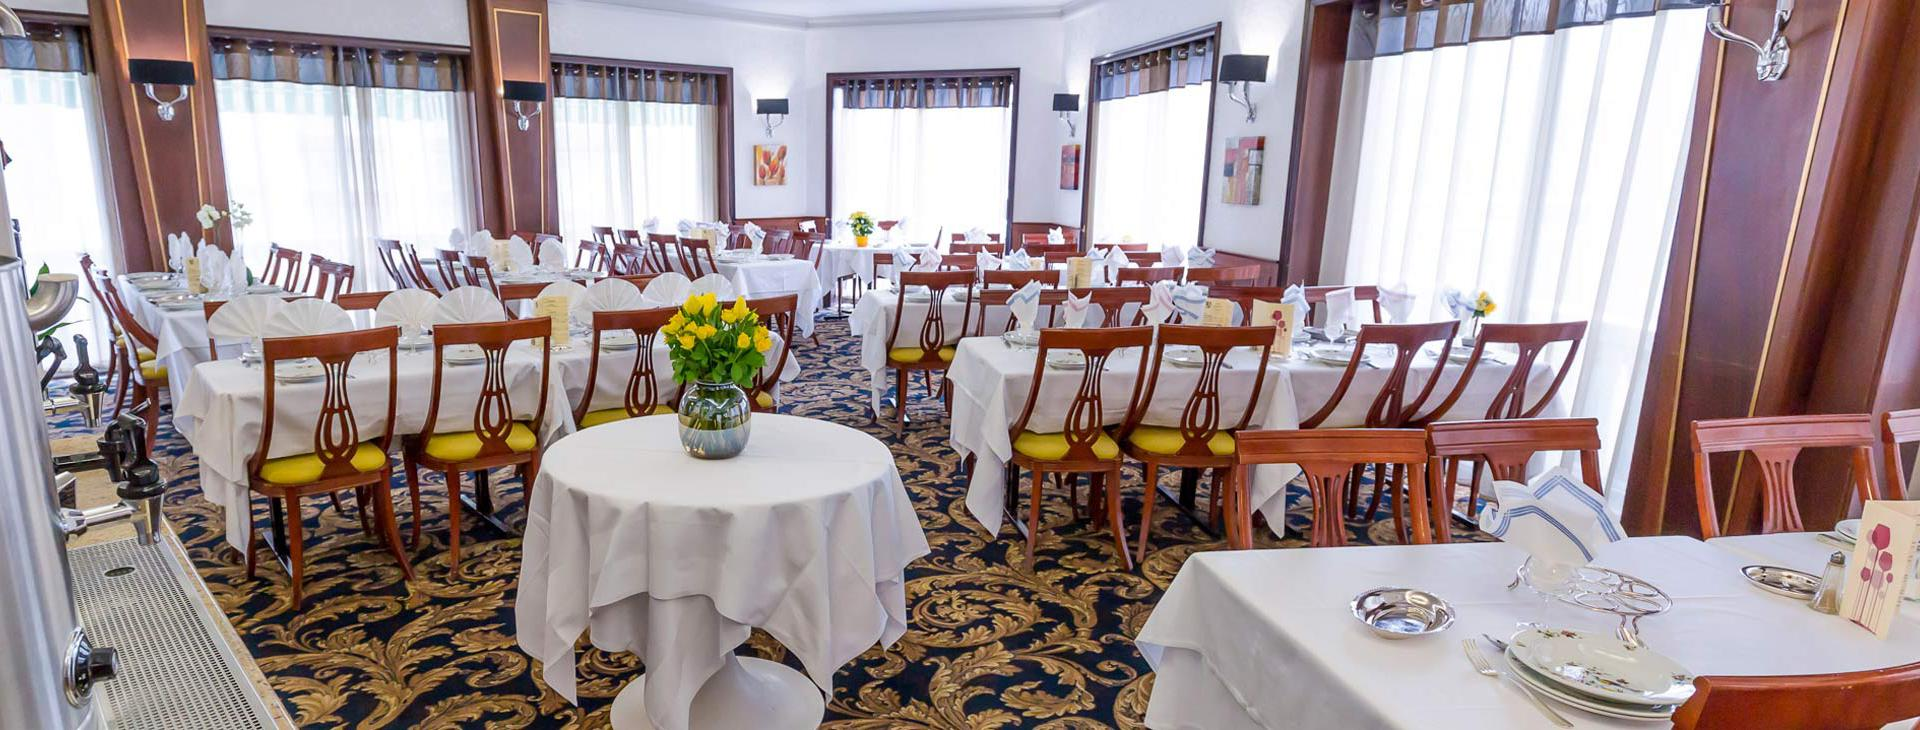 Hotel d'Irlande 3 étoiles Lourdes salle de restaurant